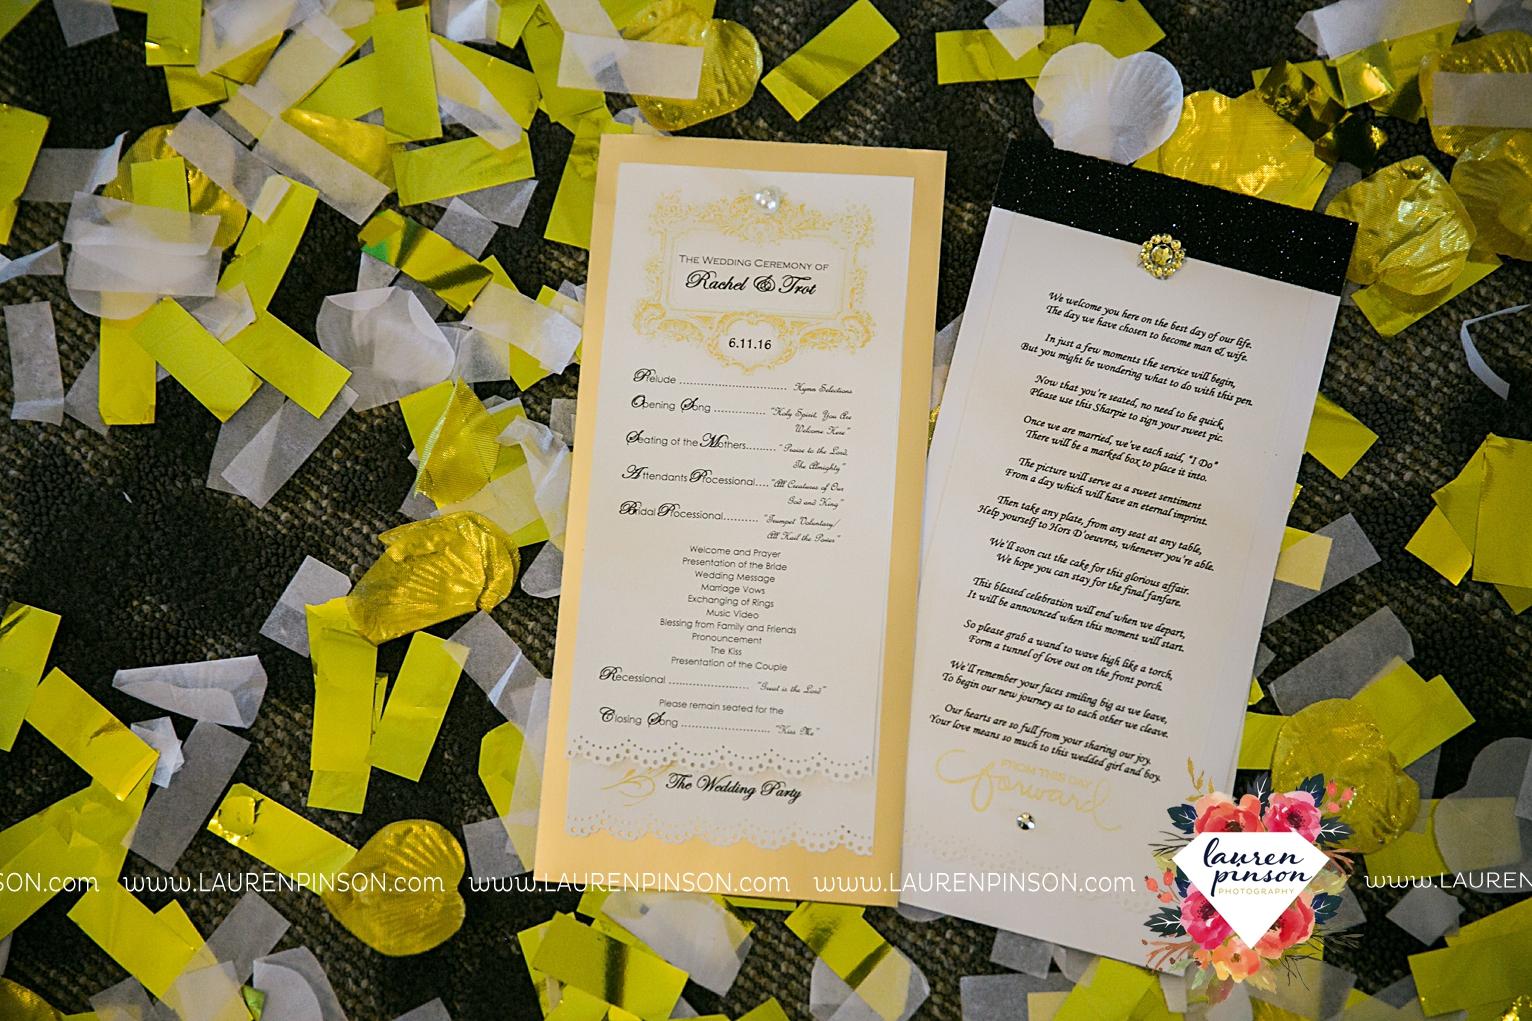 wichita-falls-texas-wedding-photographer-the-forum-by-the-kemp-mayfield-events-ulta-gold-glitter_2872.jpg